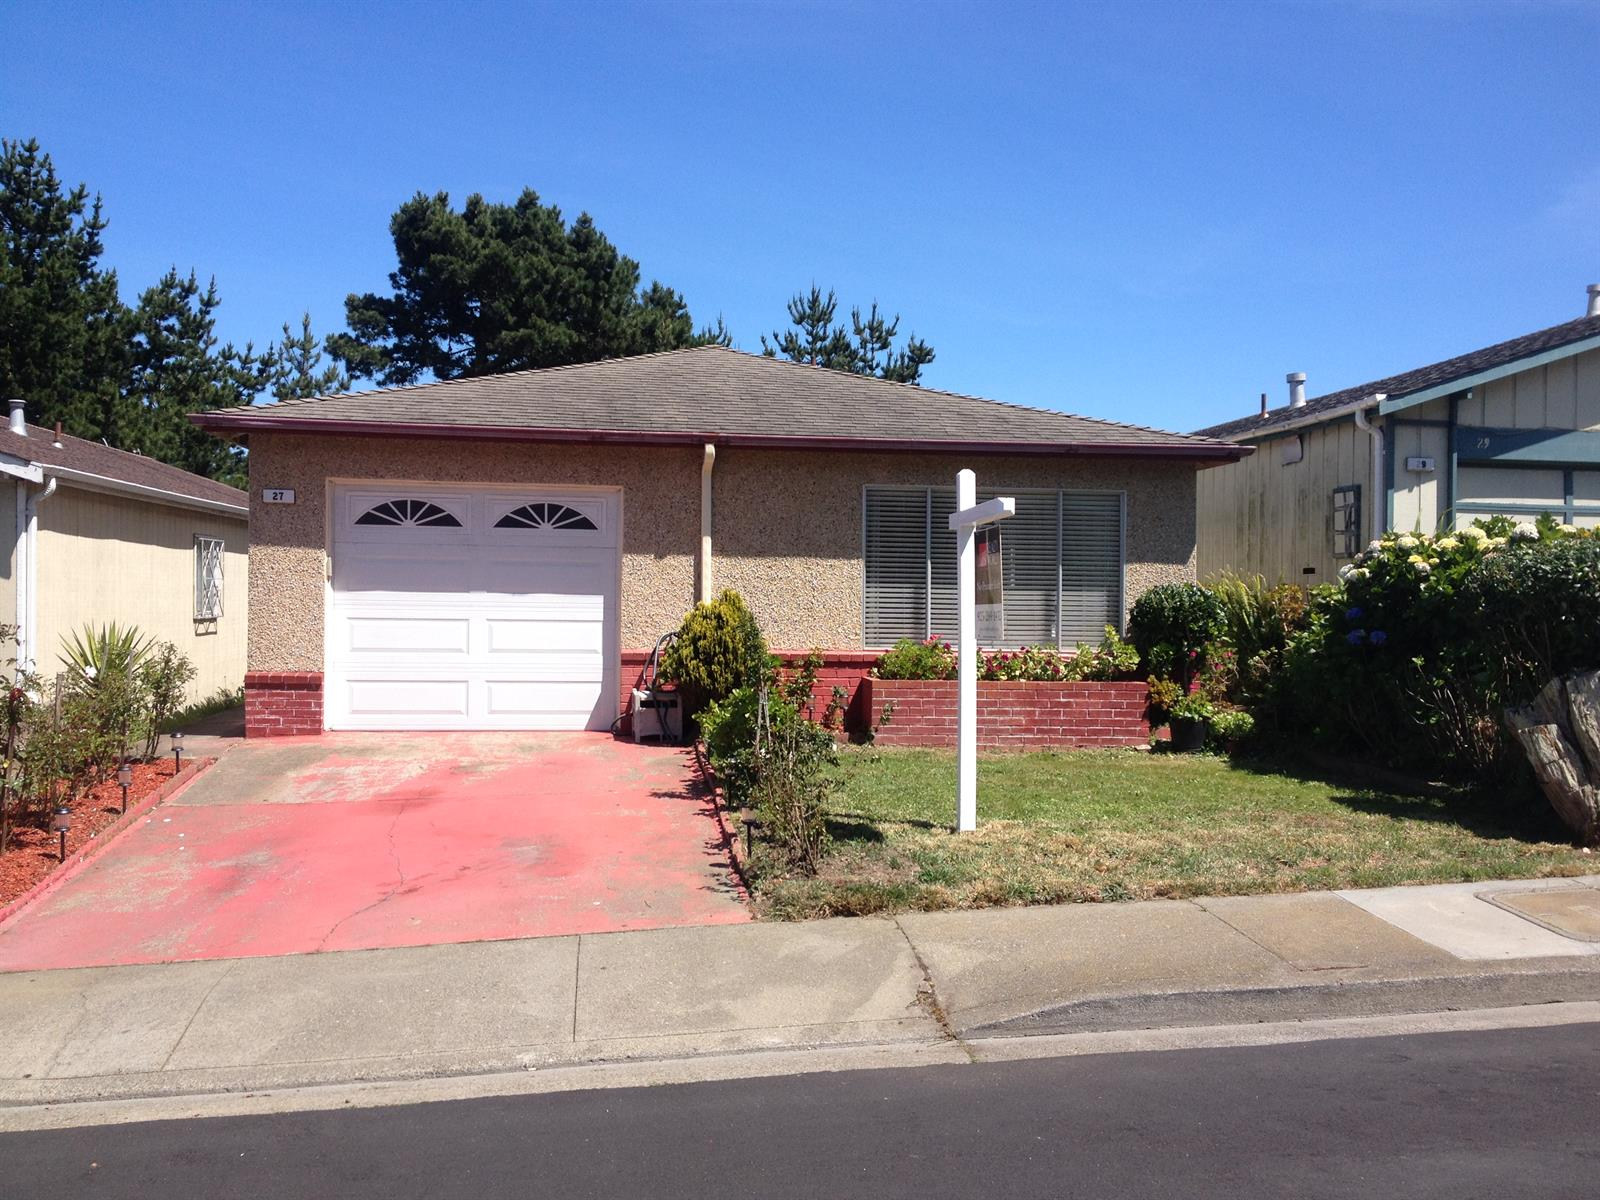 27 Morton Dr, Daly City, CA 94015